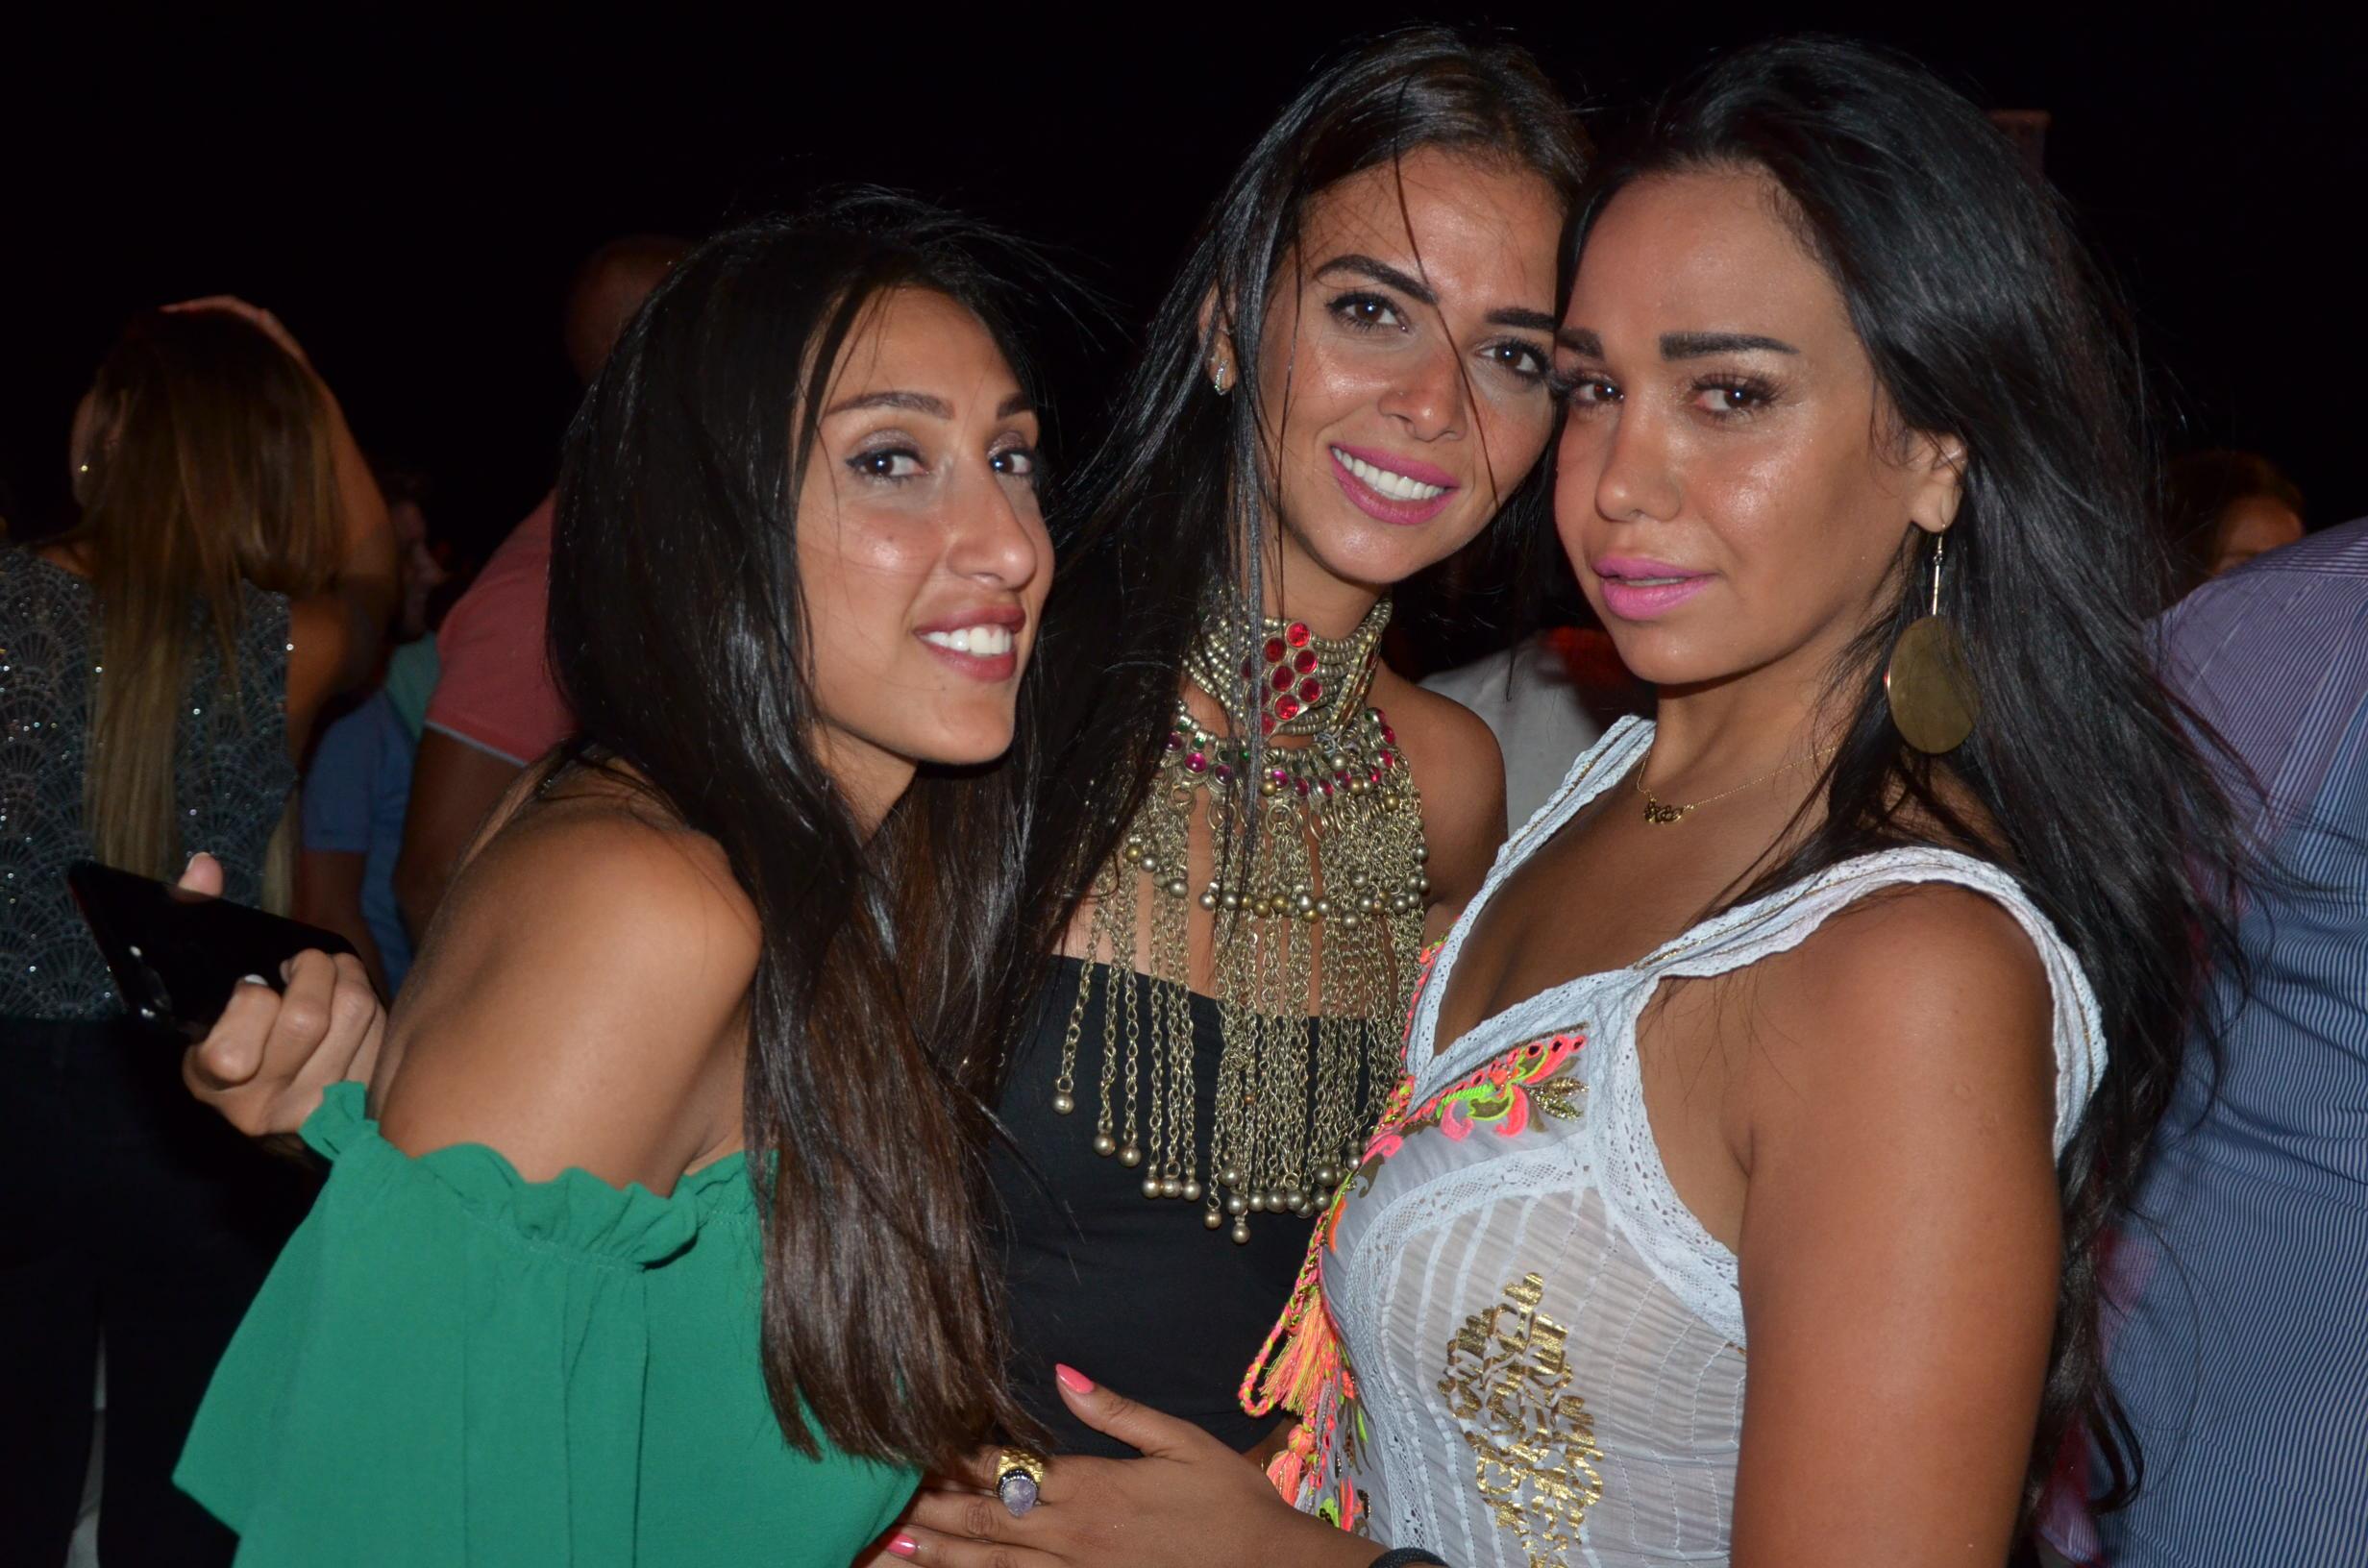 Ms. Farah Sarhan, Ms. Manar Abdou & Ms. Mai Abou Hashima